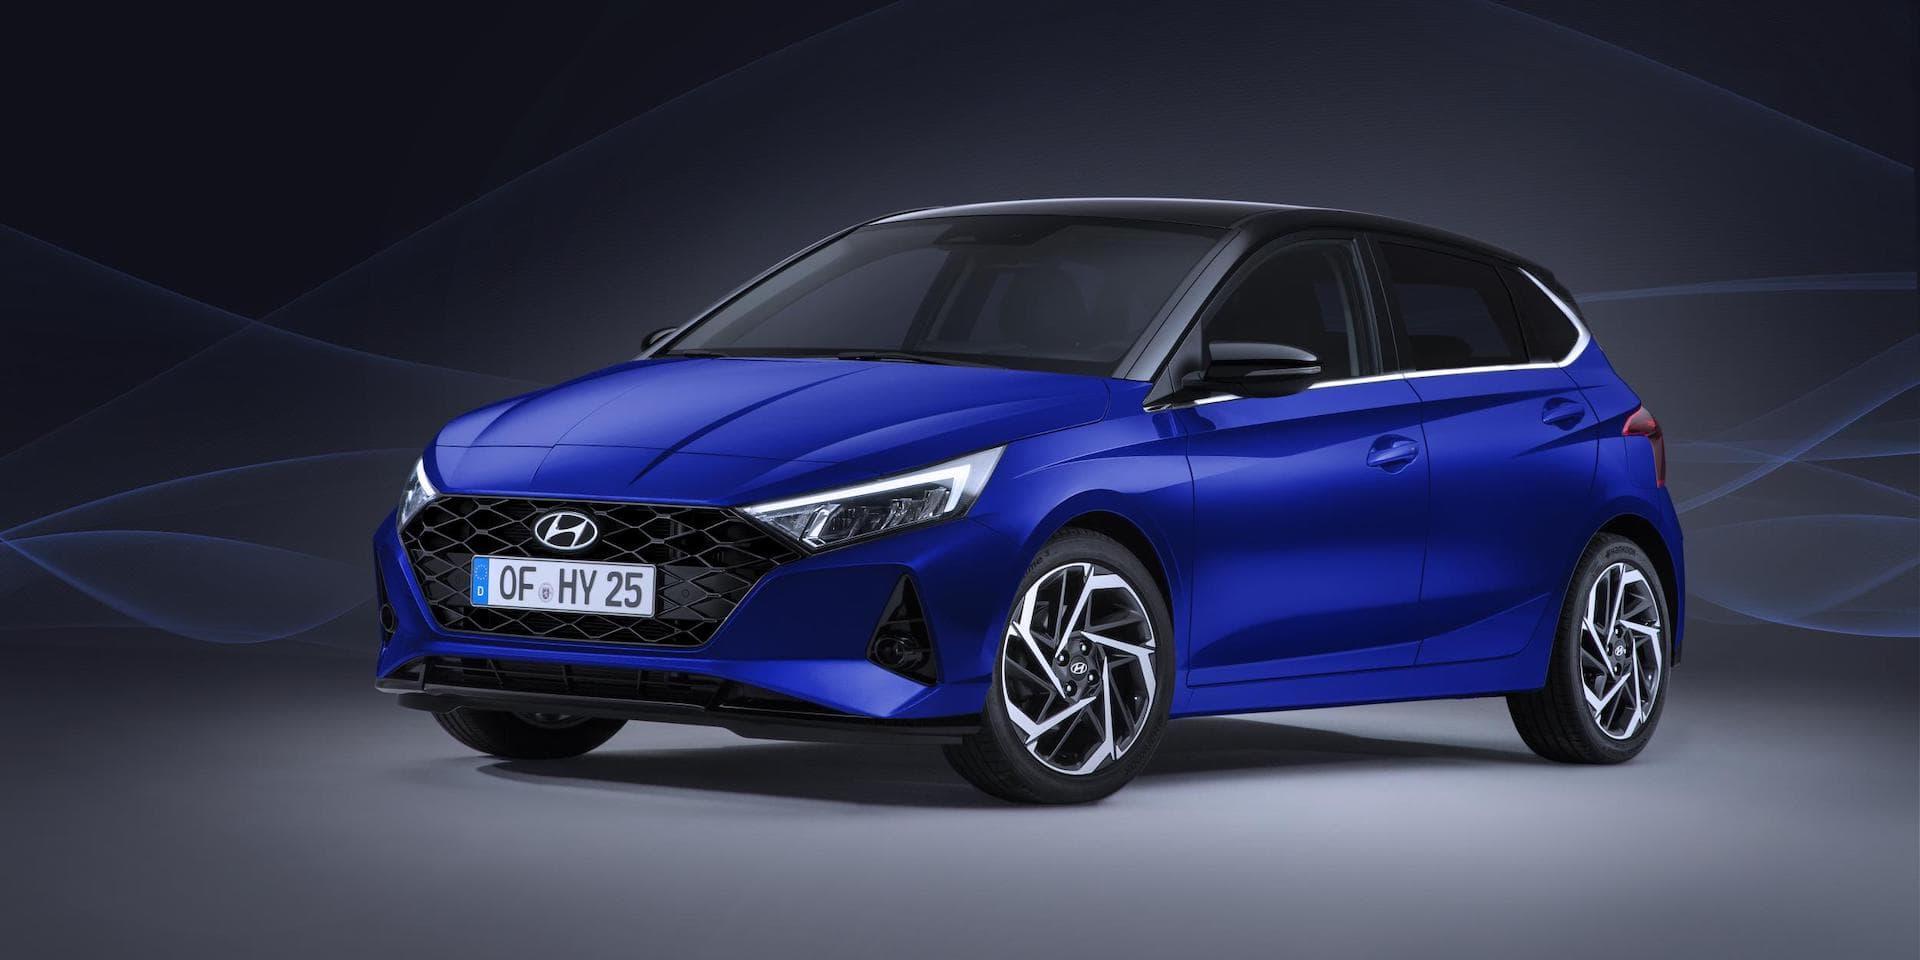 2020 Hyundai i20 revealed   The Car Expert